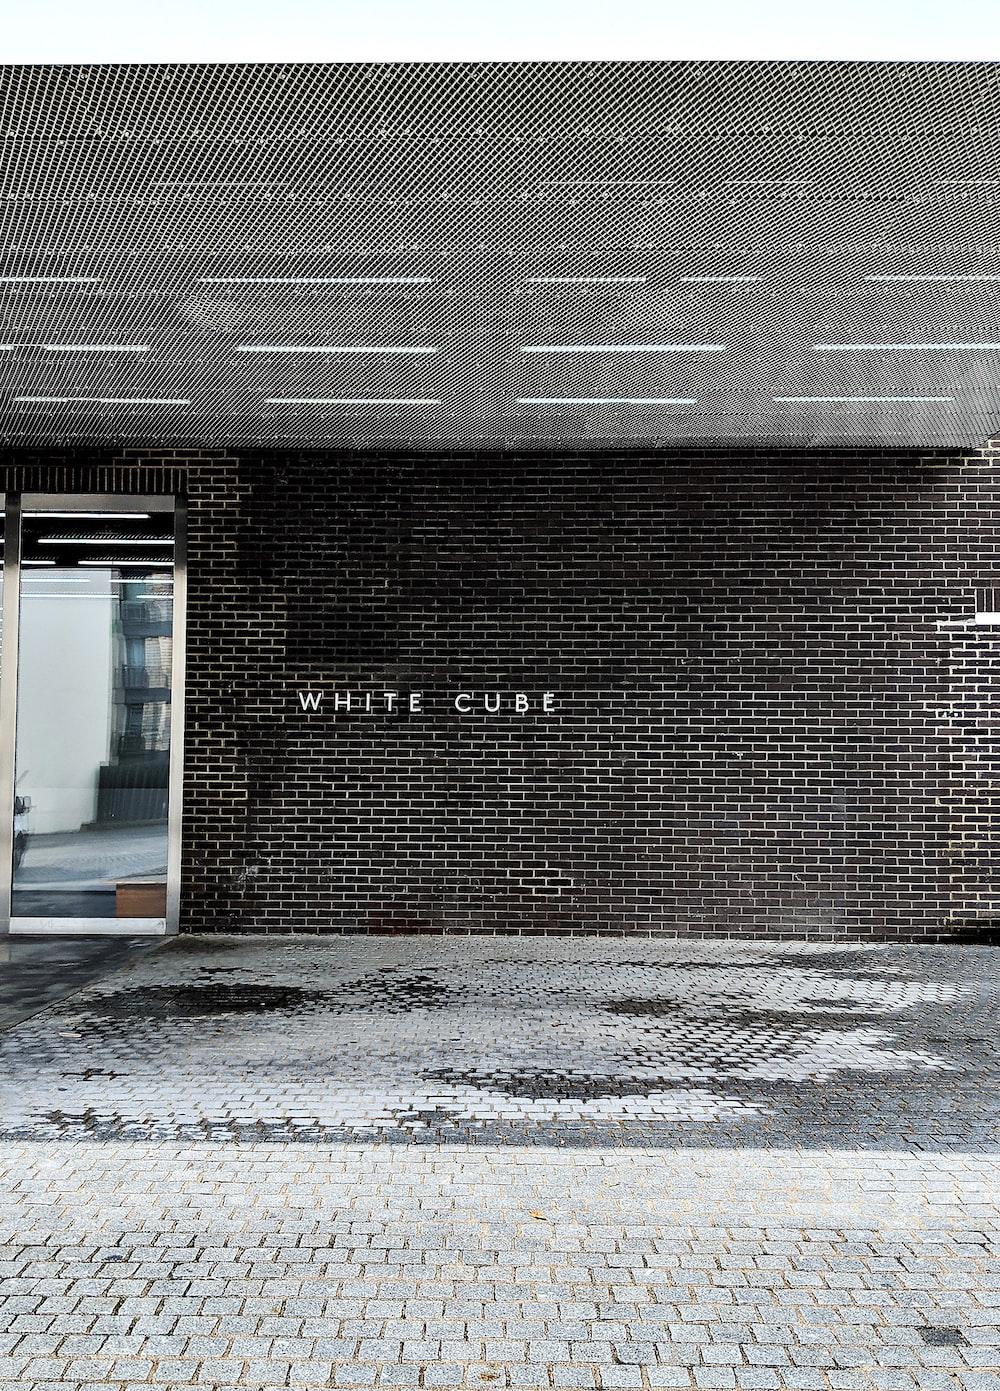 White Cube building